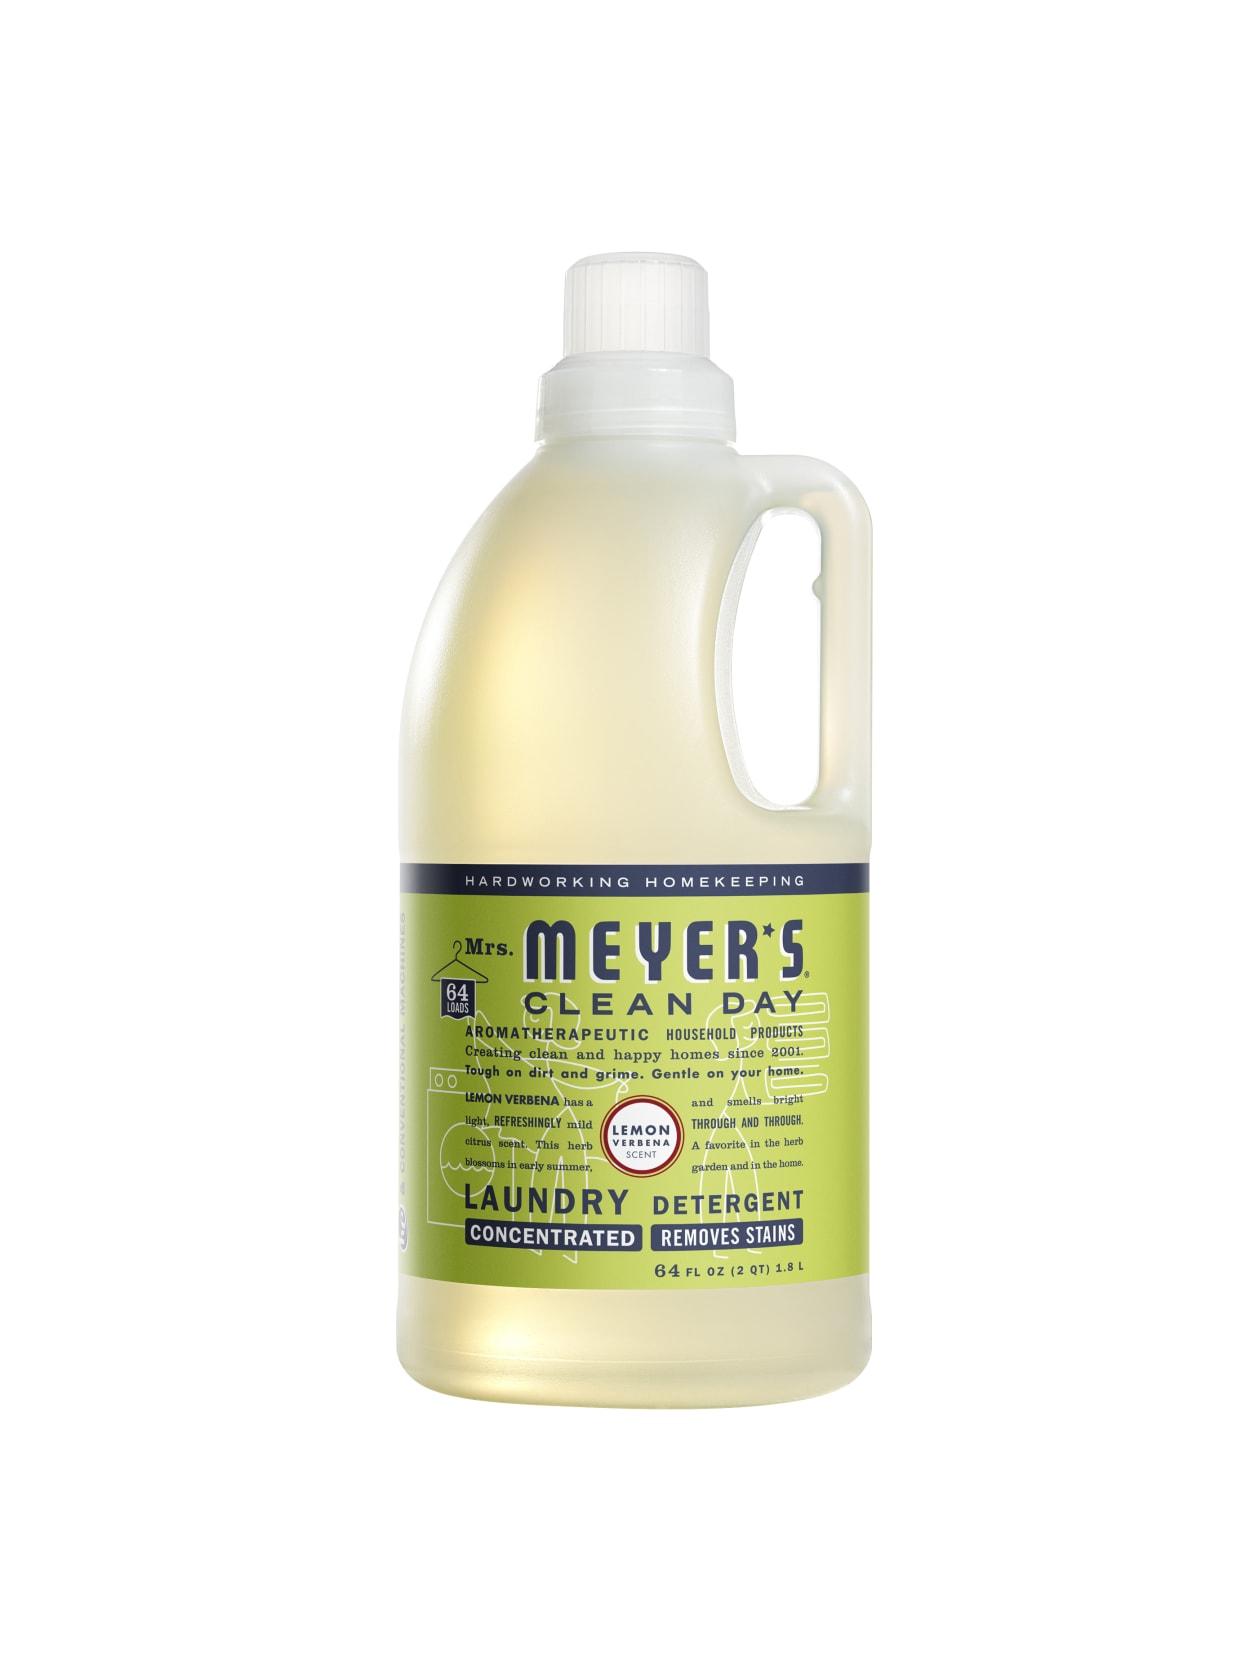 Mrs Meyers Clean Day Lemon Detergent